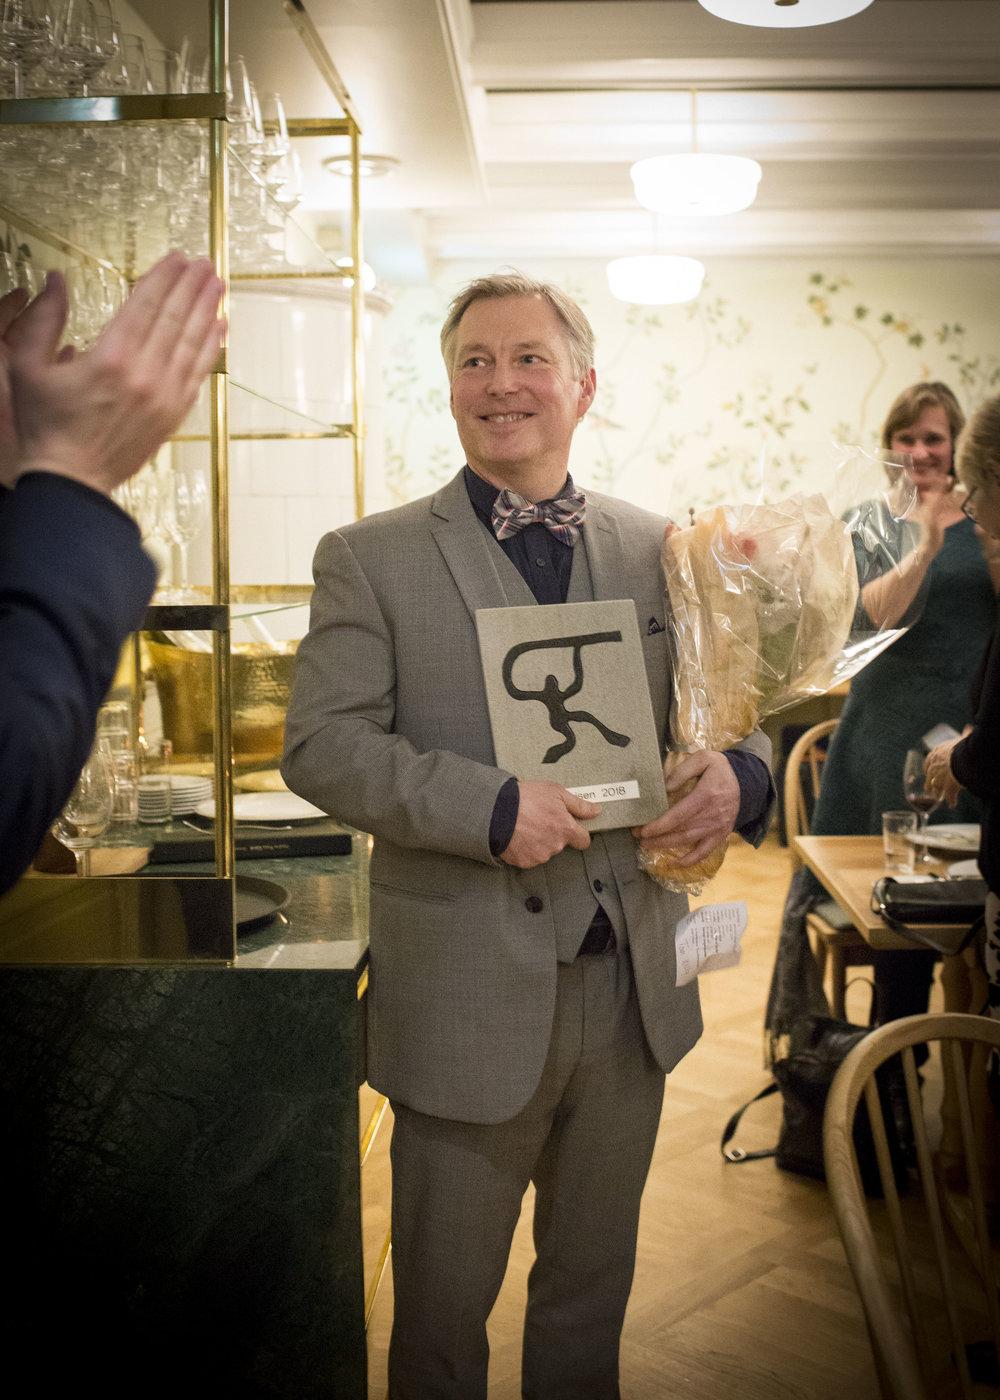 Rff-prisen for 2018 ble tildelt Tom Willy Rustad for hans virke som musikar og pedagog. Foto: Noregs Ungdomslag 2018